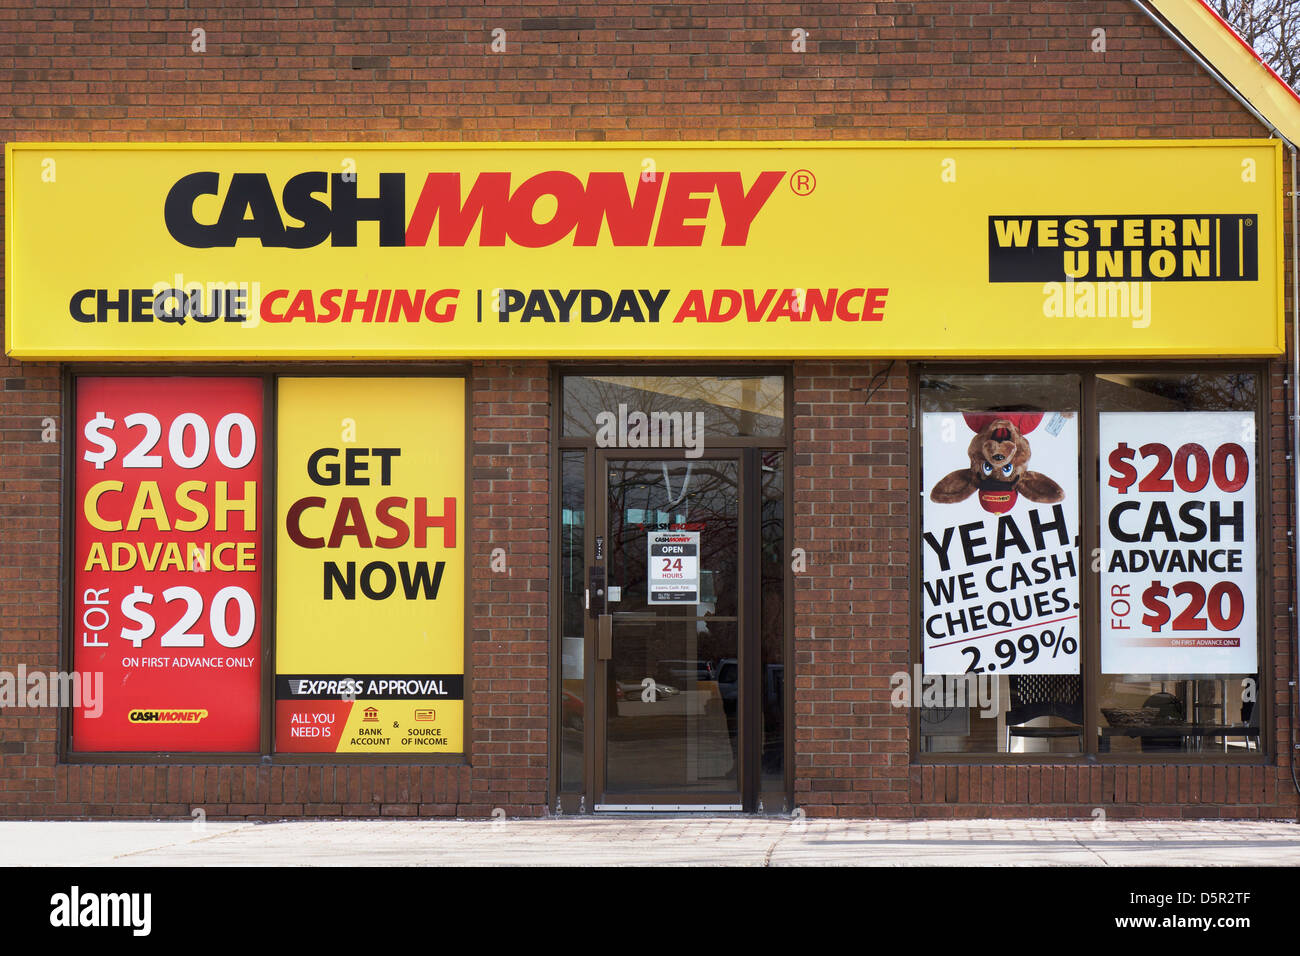 Cash advance td bank image 1